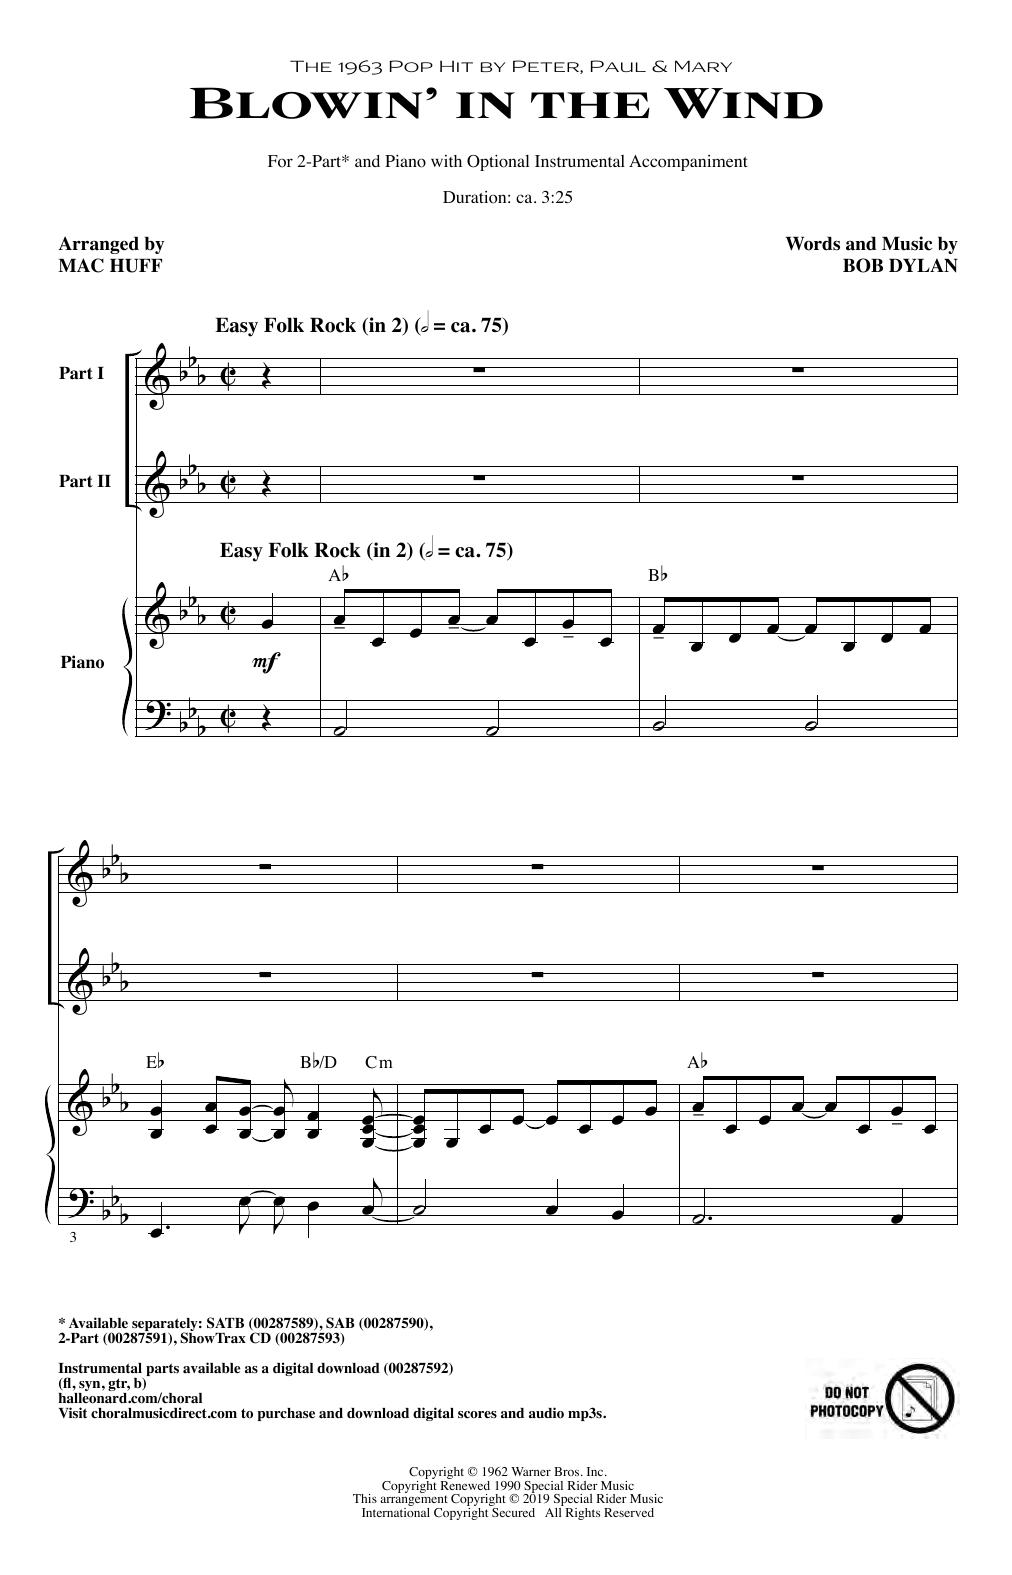 Blowin' In The Wind (arr. Mac Huff) (2-Part Choir)